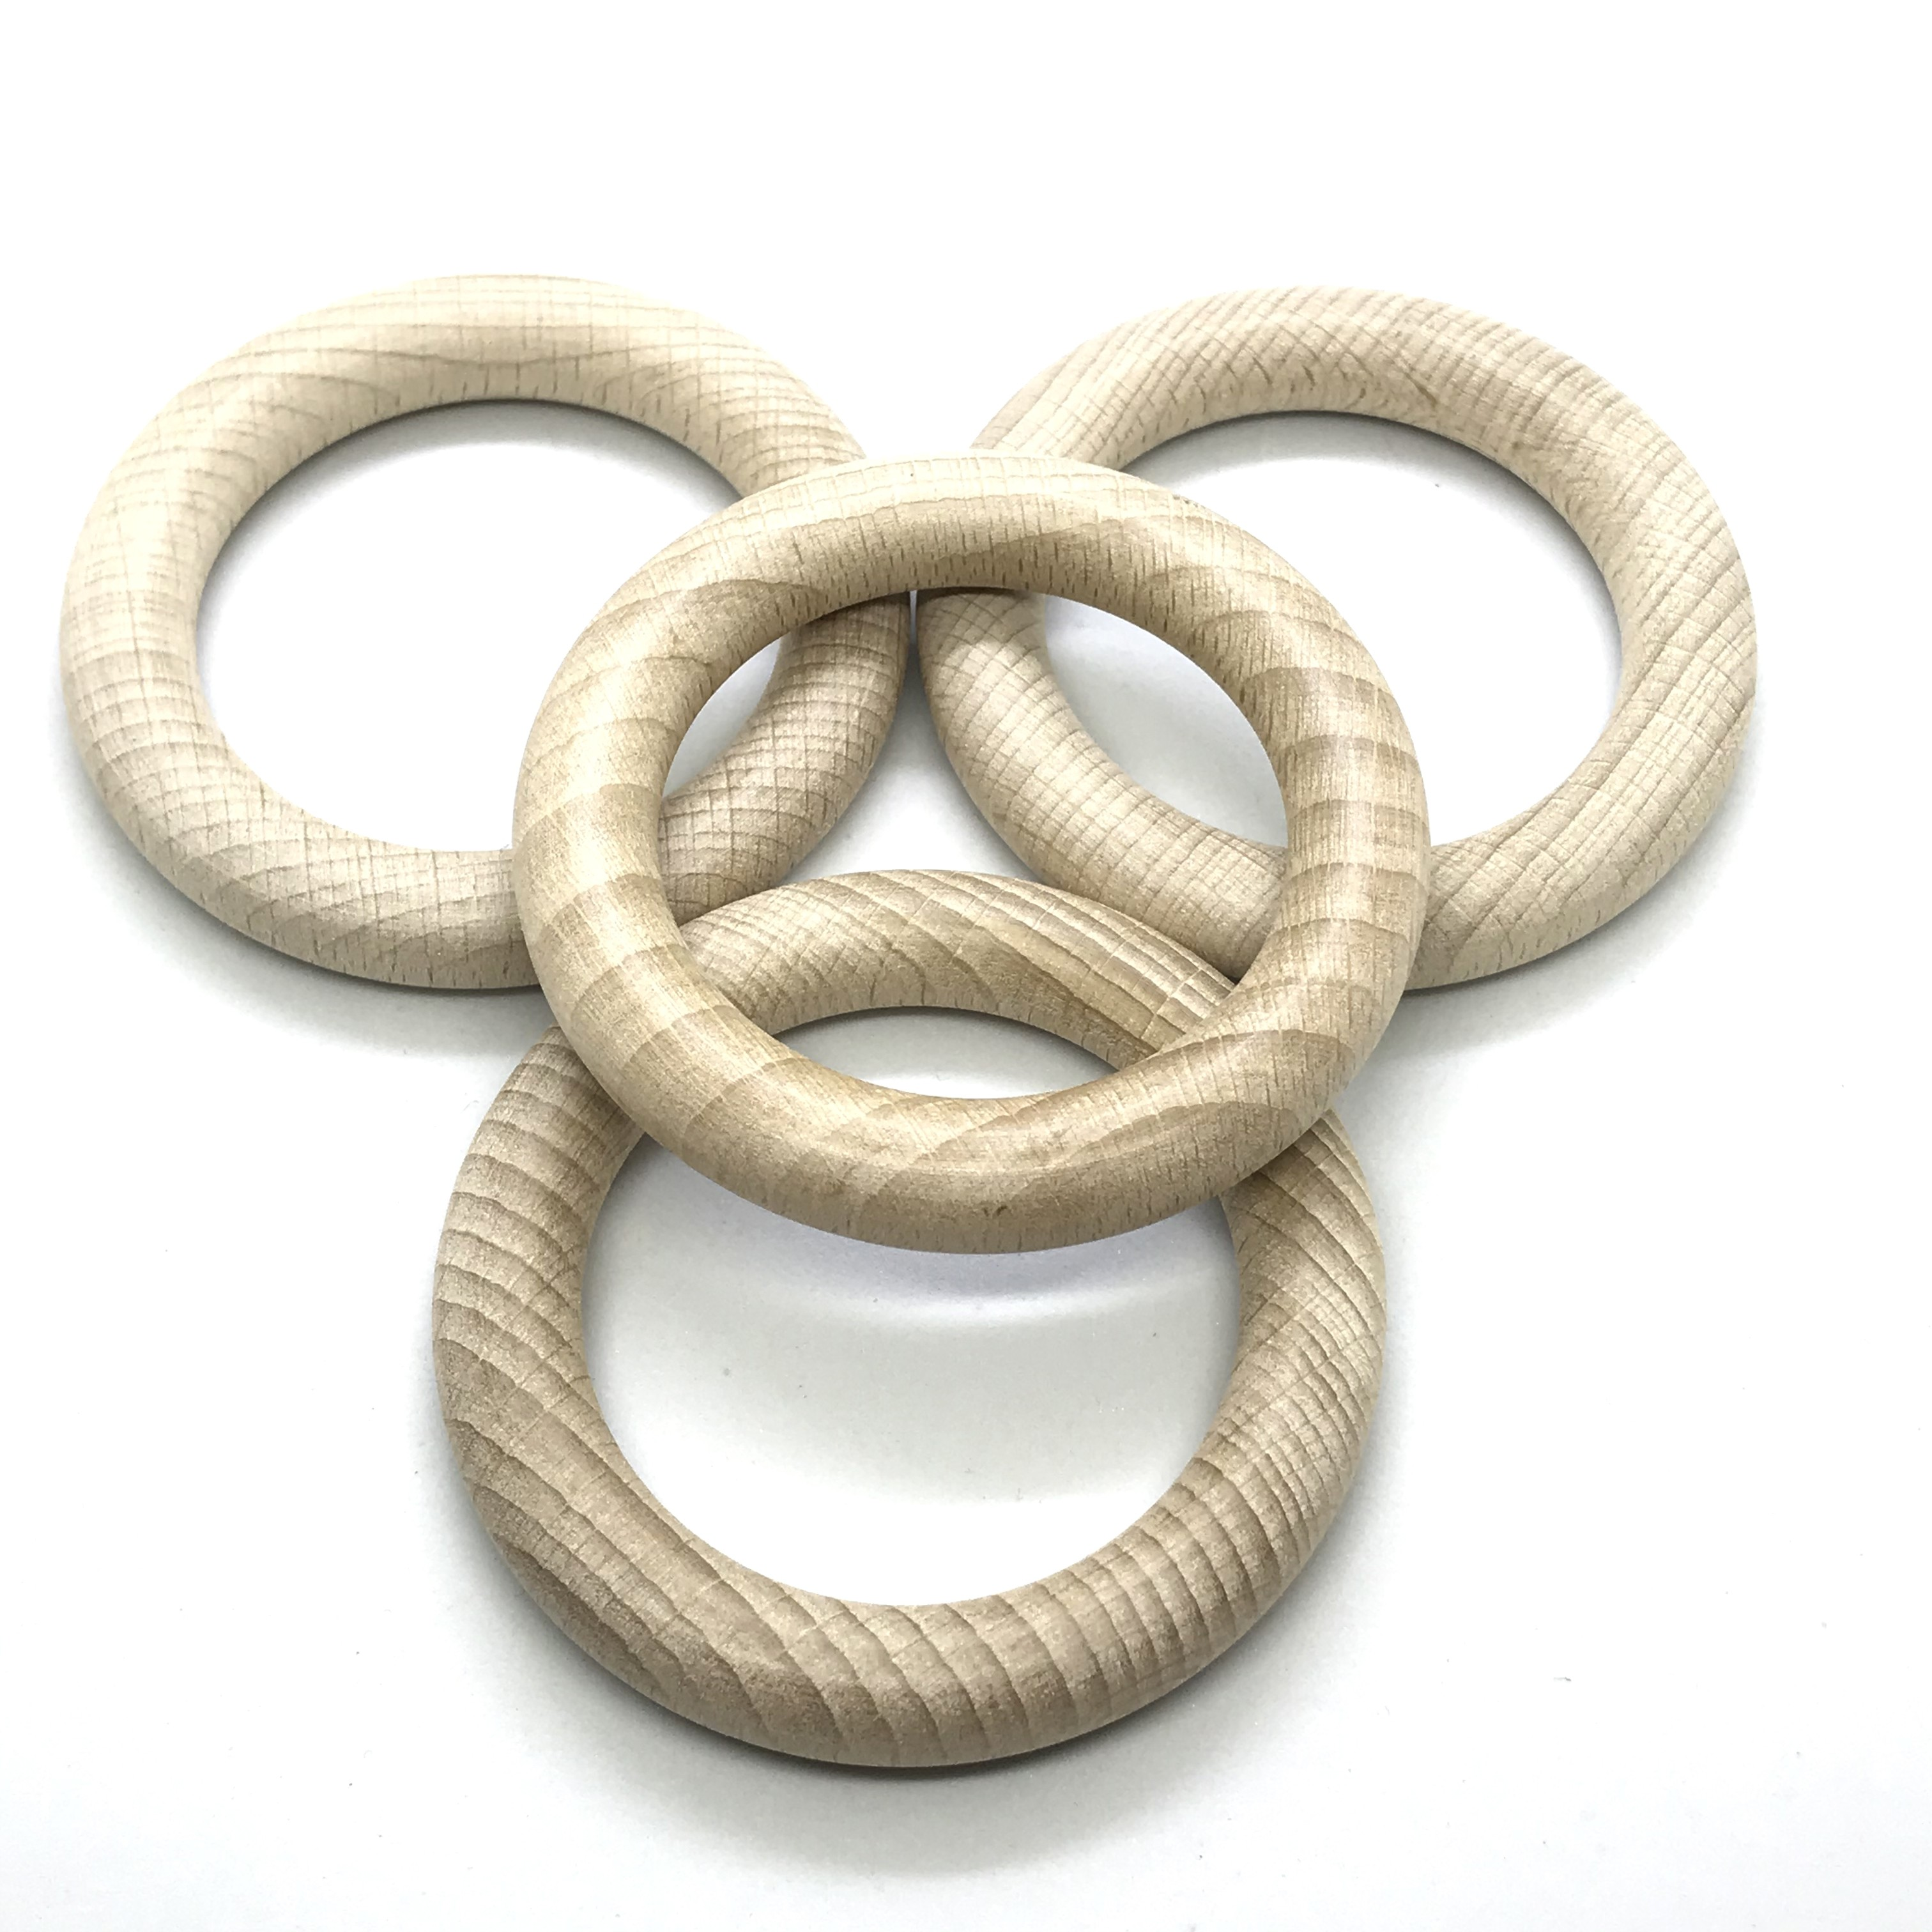 25pcs 7.0cm Organic Beech Wood Ring